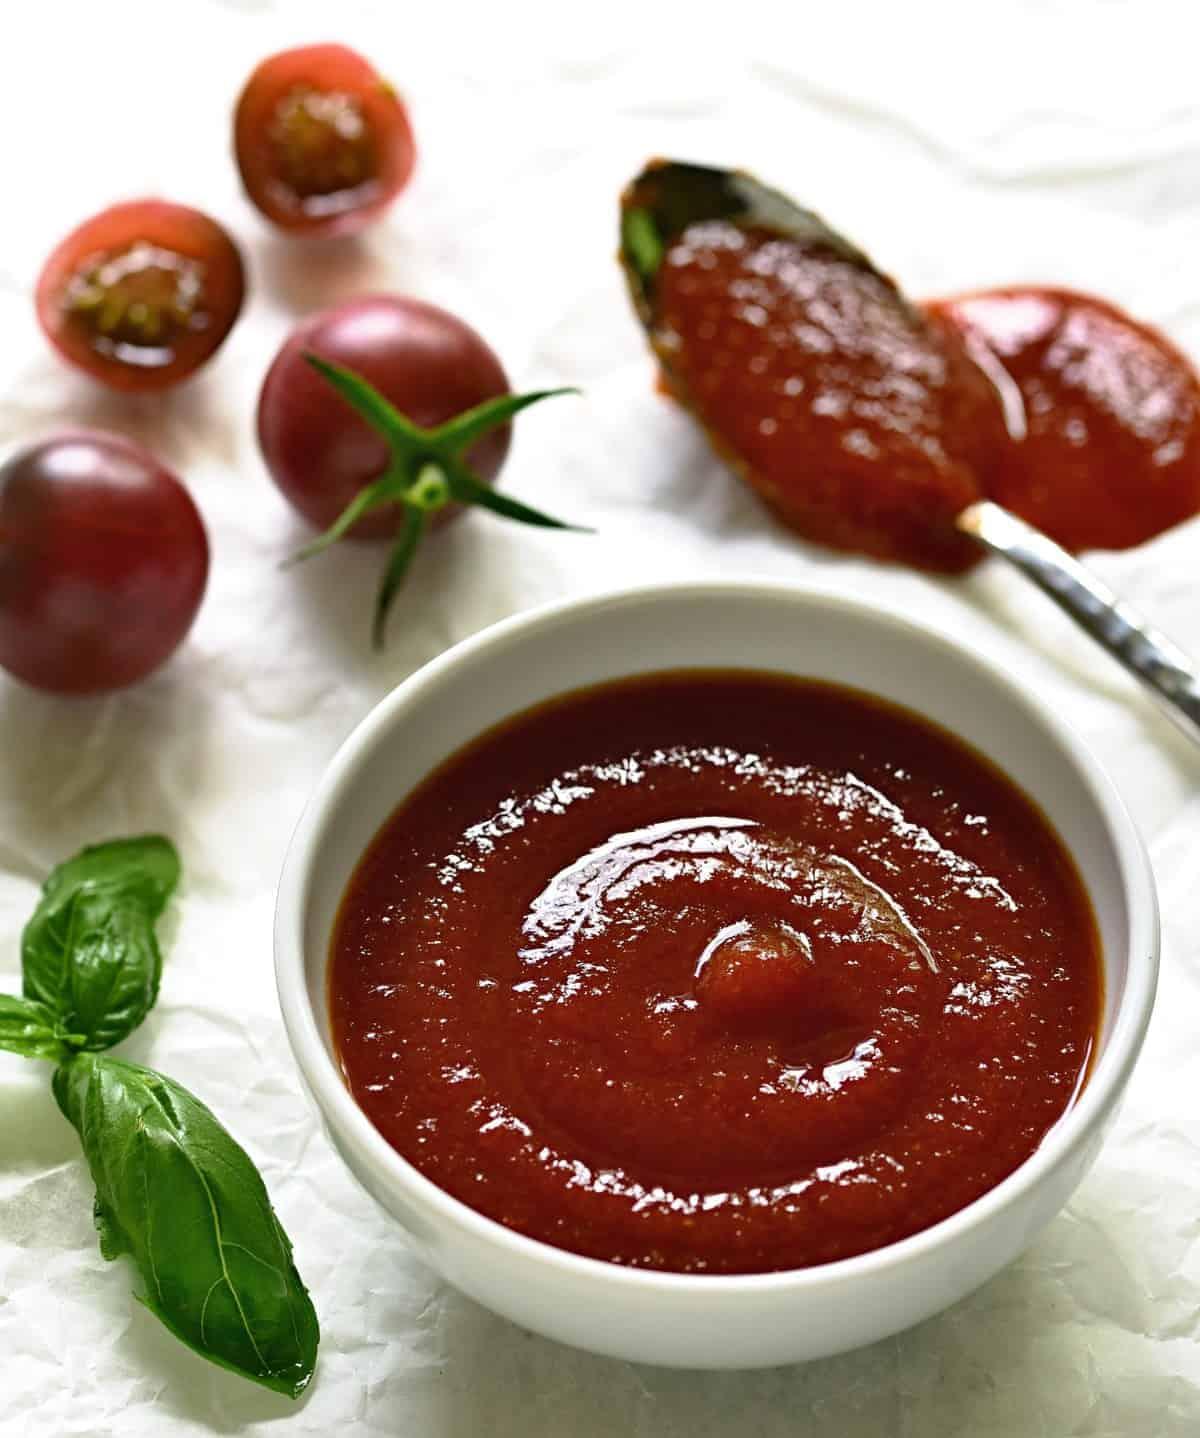 Homemade tomato ketchup.